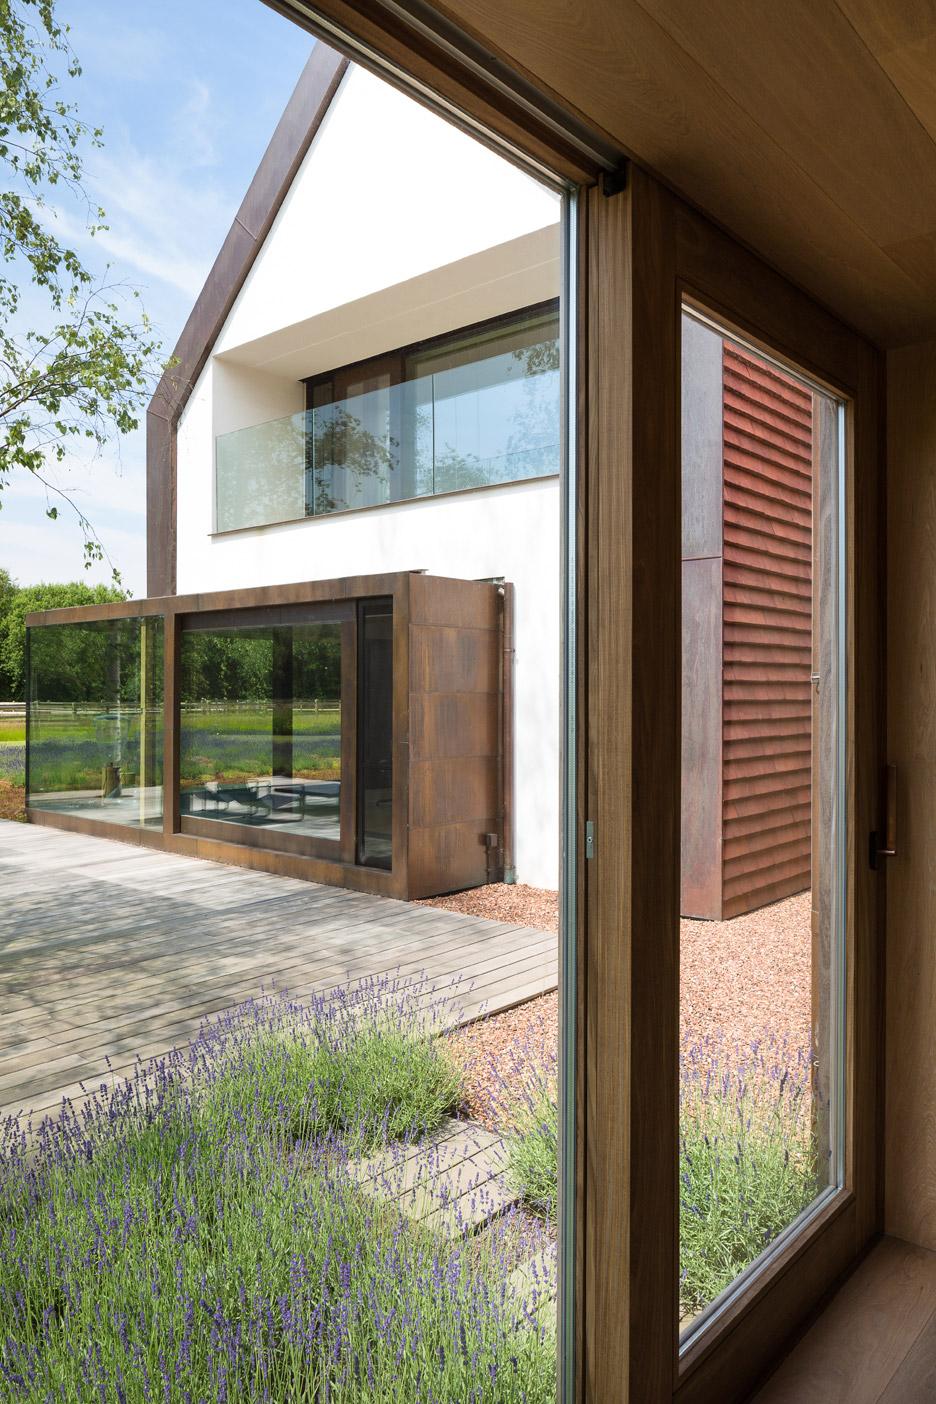 Olmen Farmhouse Covered With Terracotta Tiles